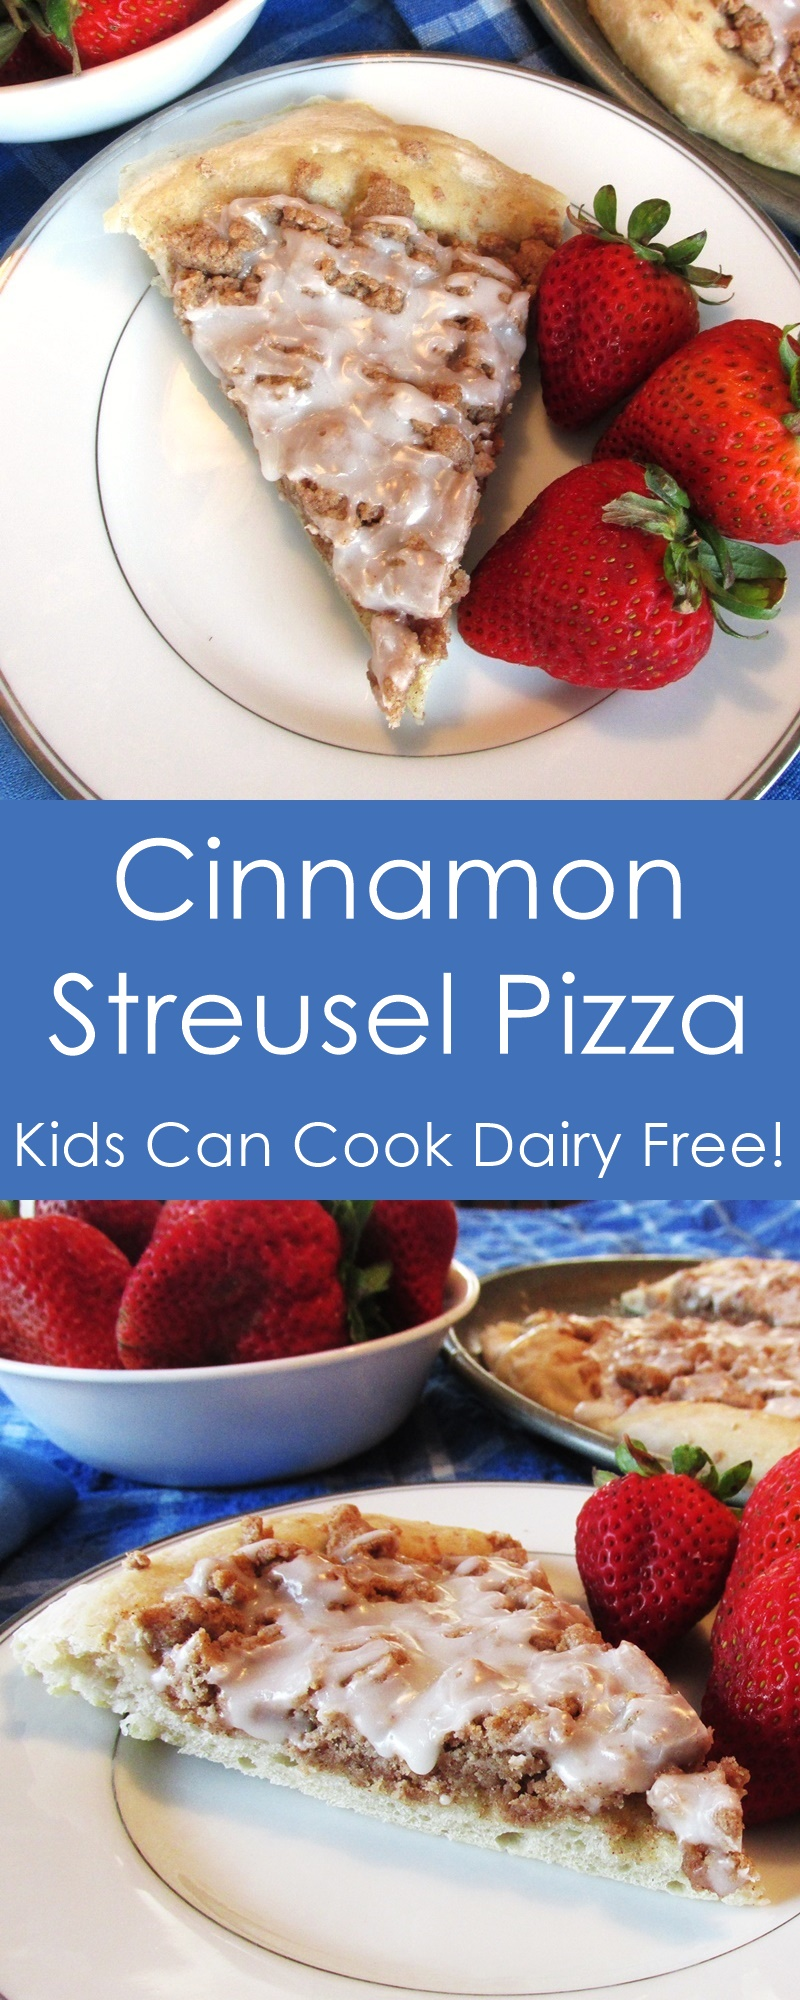 Vegan Cinnamon Streusel Dessert Pizza Recipe - a kids can cook dairy-free, egg-free, nut-free dessert! (gluten-free optional)